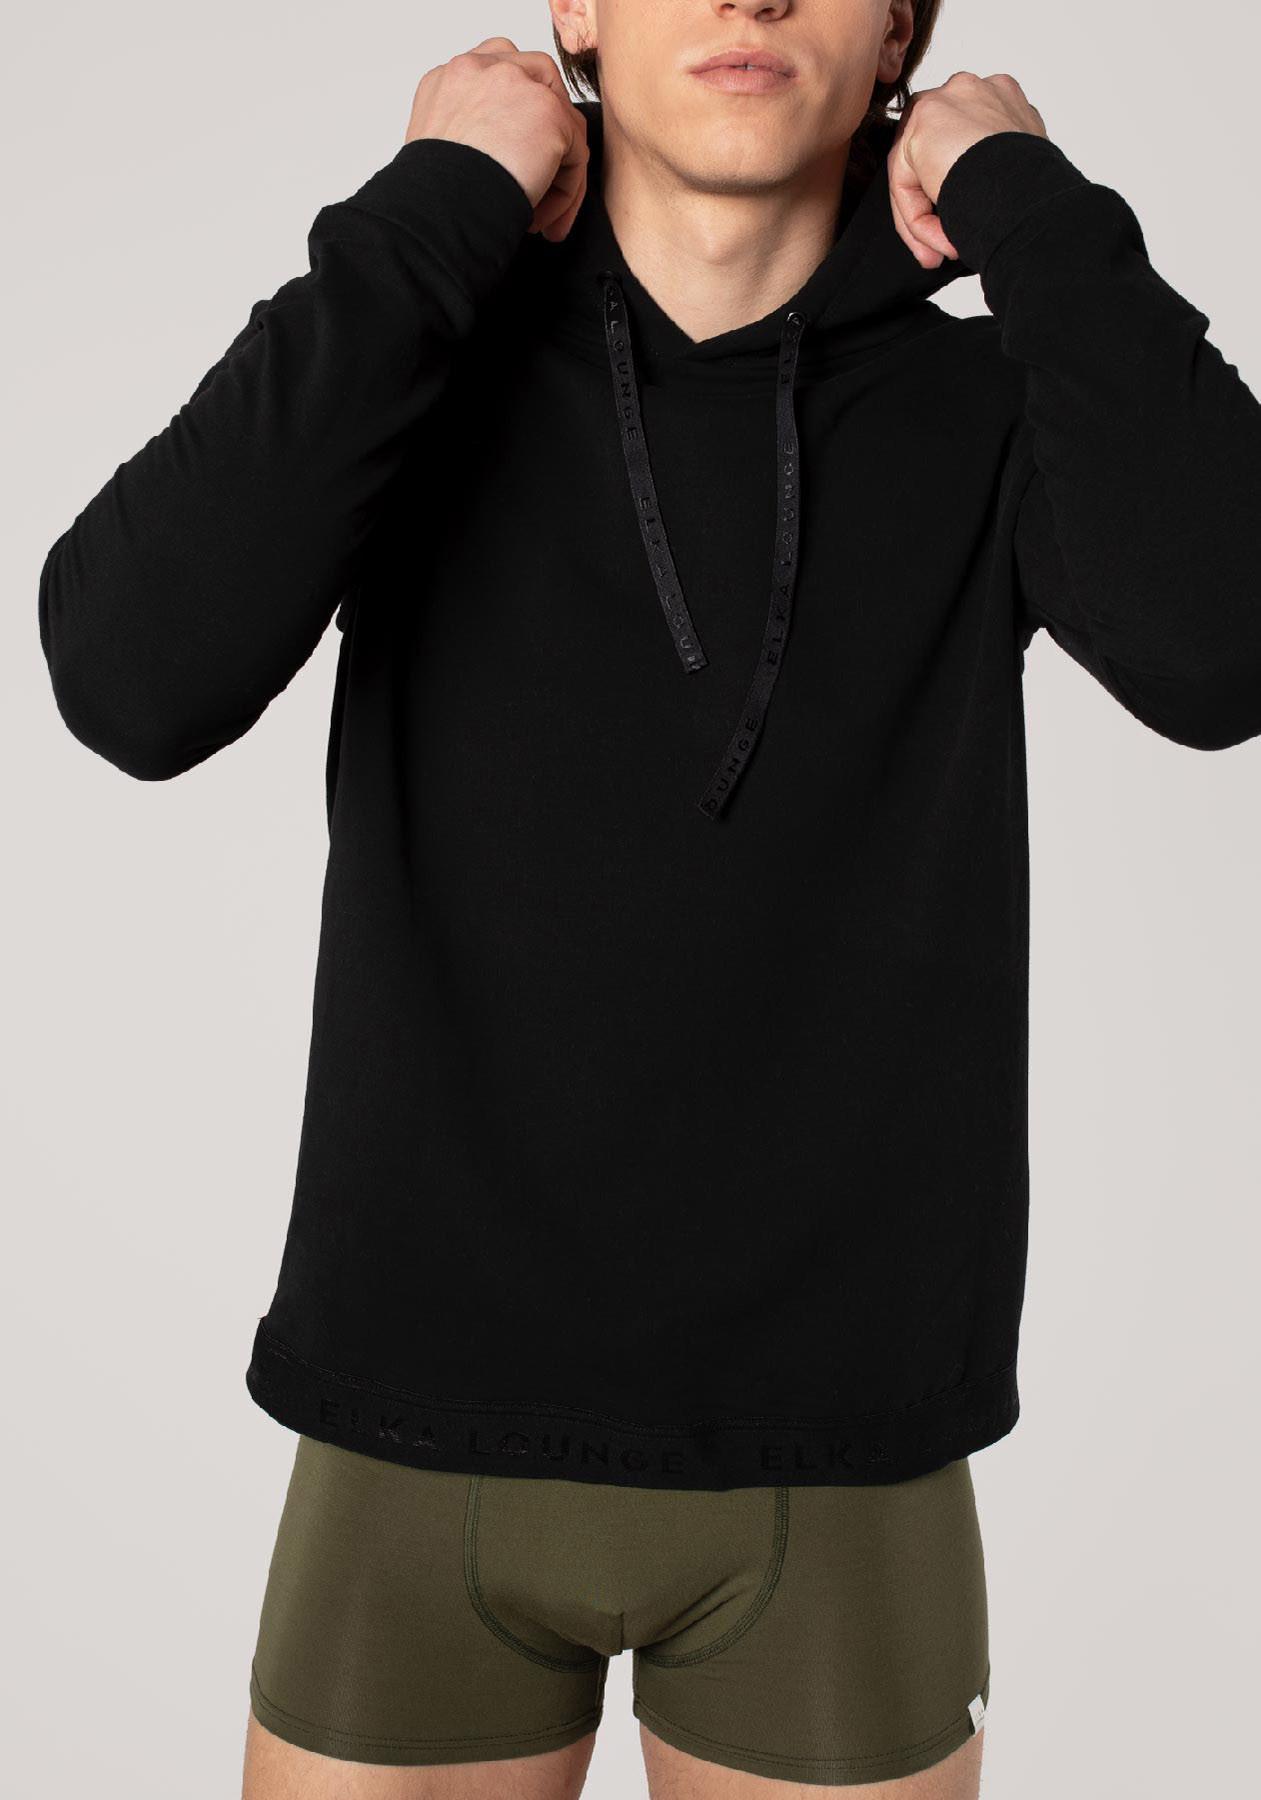 Men-Sweatshirt-ELKA-Lounge-M00574